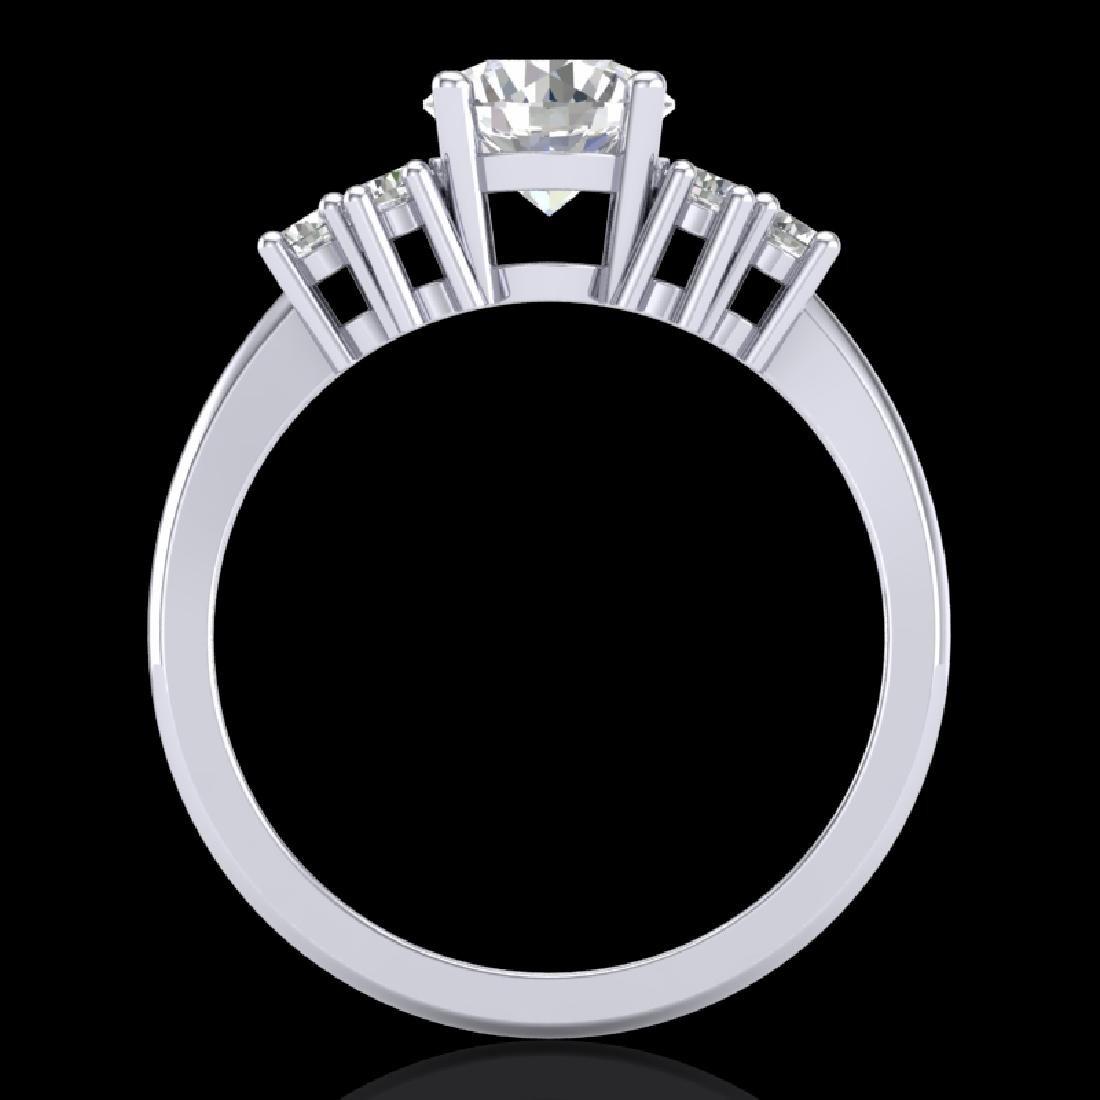 1.5 CTW VS/SI Diamond Solitaire Ring 18K White Gold - 2